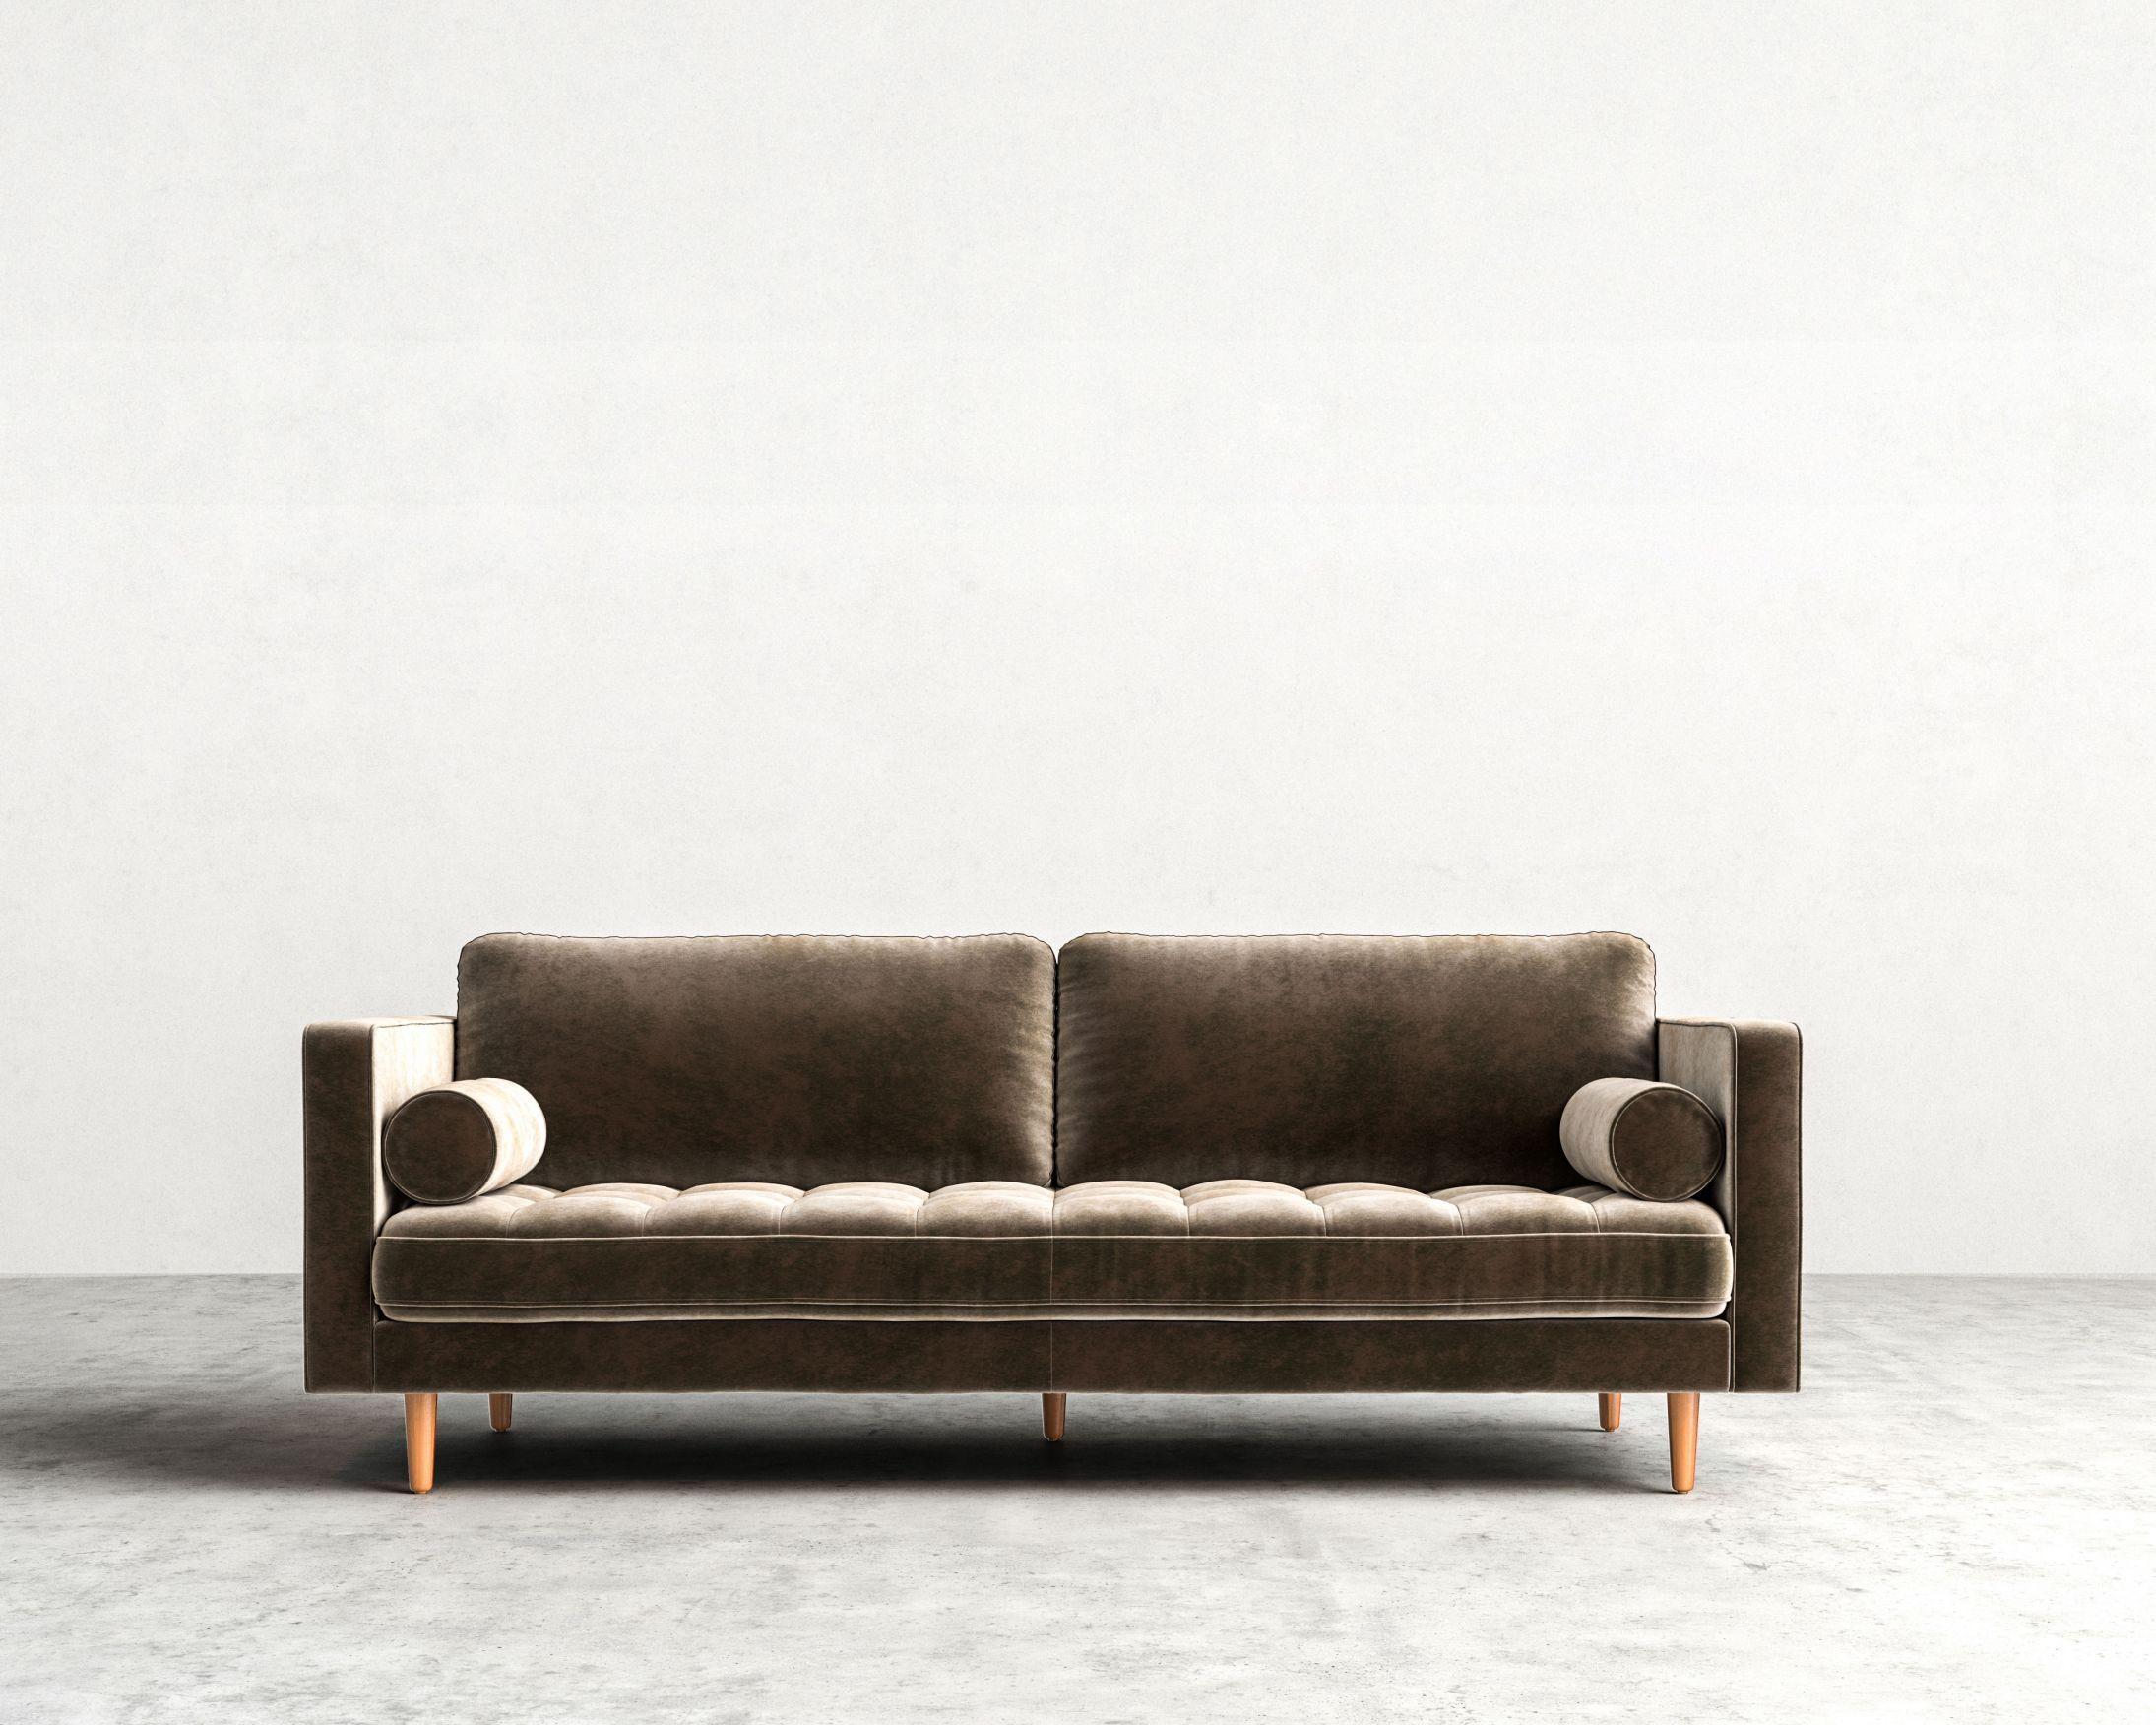 Luca Sofa | Mid Century Modern Sofa | Rove Concepts In Mid Range Sofas (Image 13 of 20)